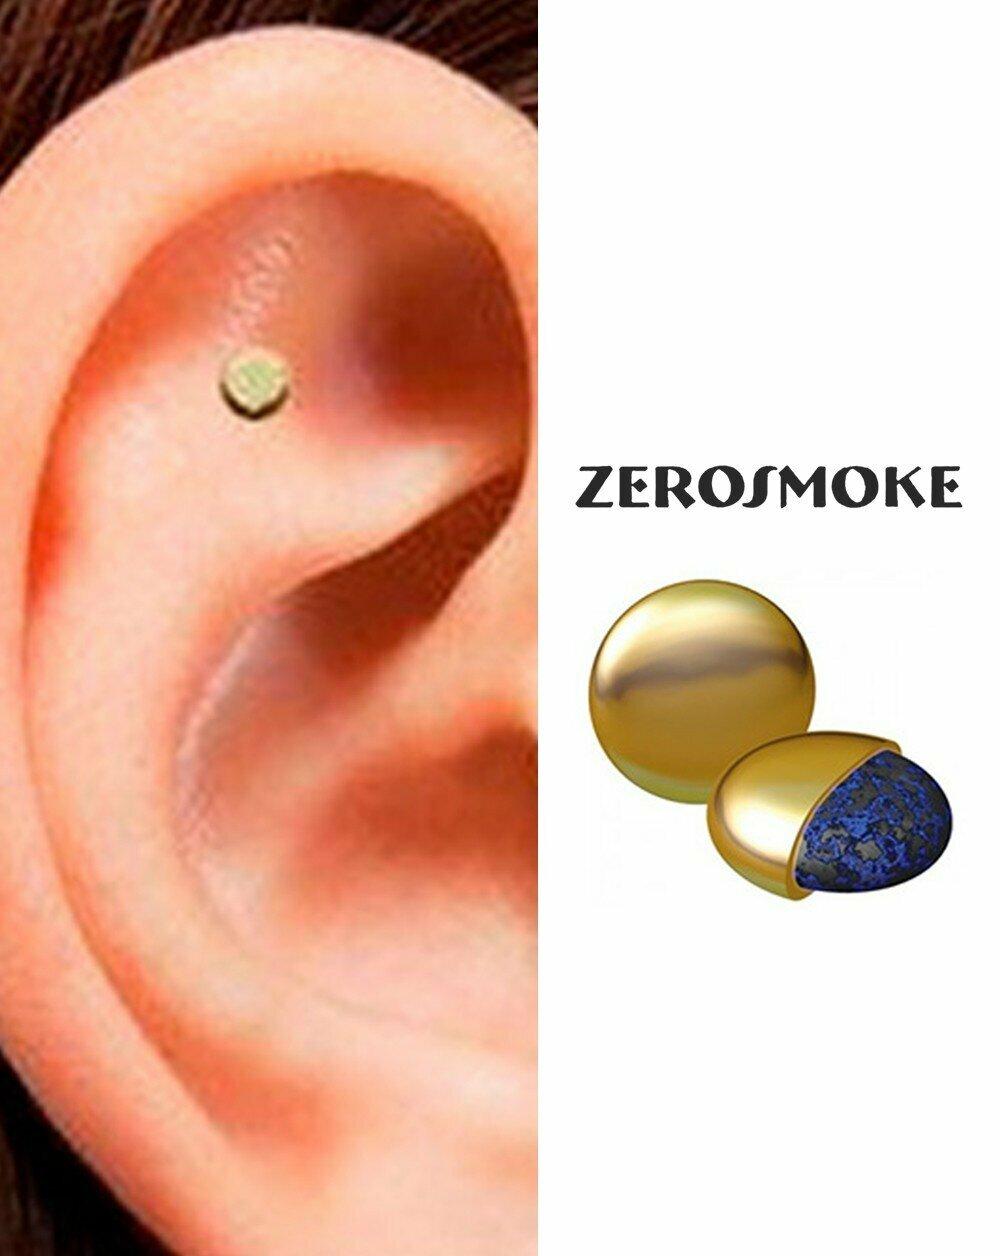 Zerosmoke - биомагниты в Симферополе